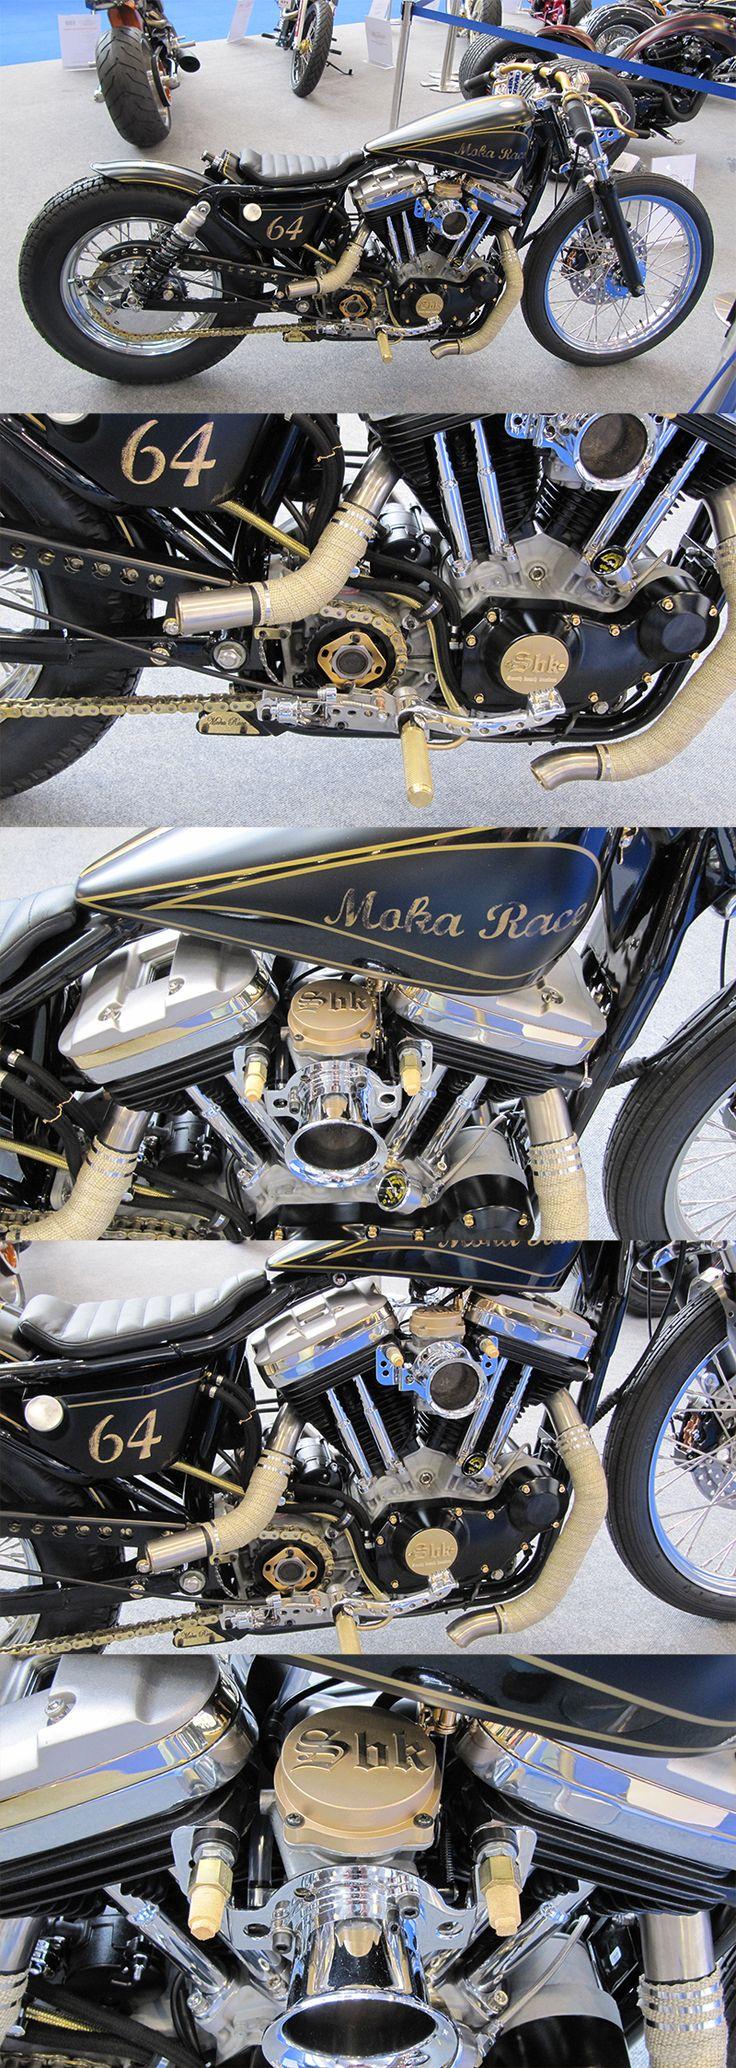 Maka Race number 64, at Essen #AMD world championship in custom bike building